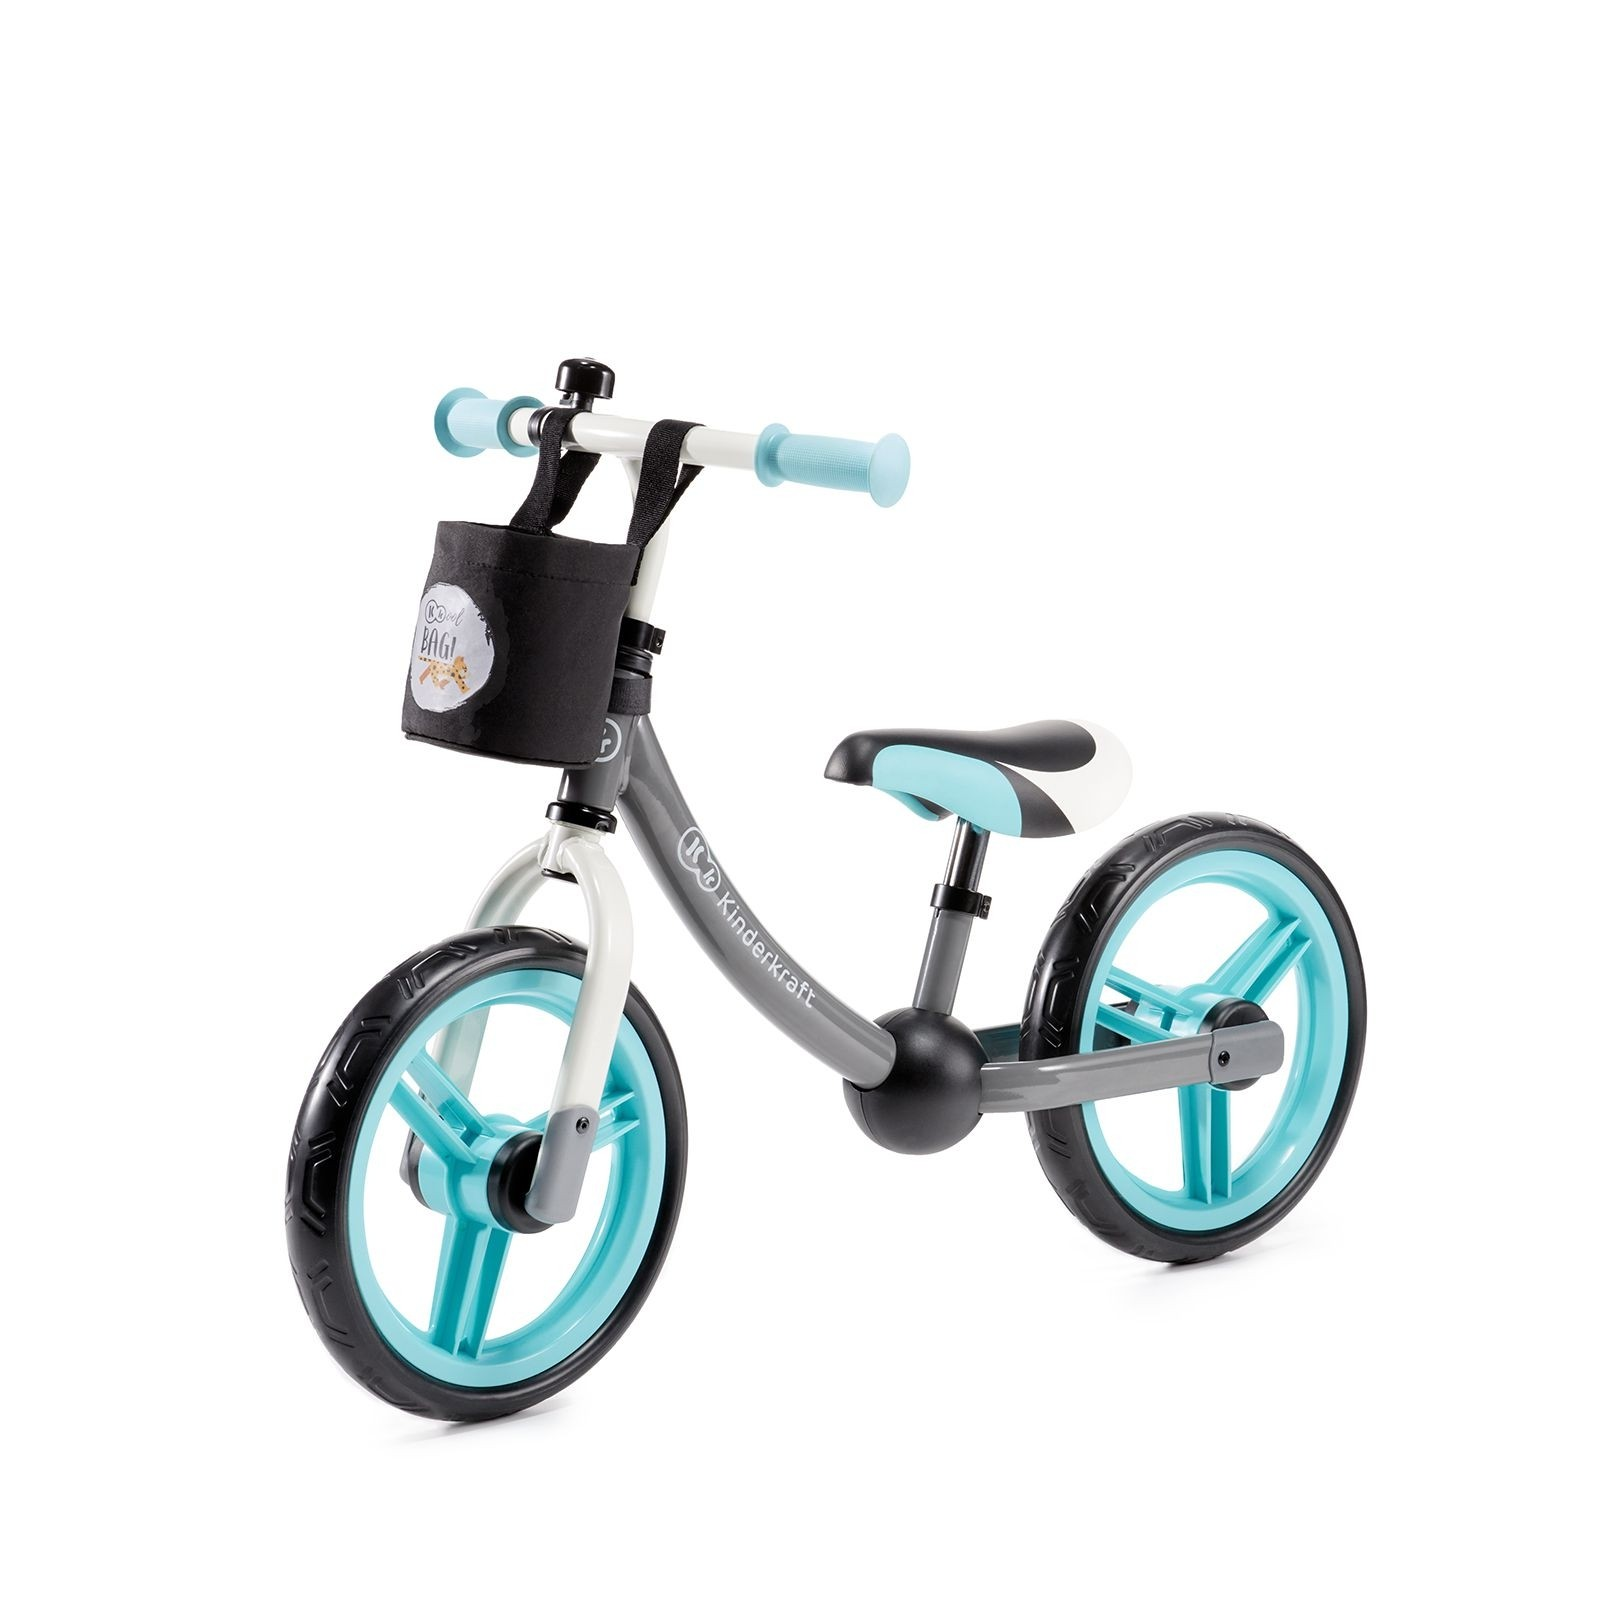 Balans bicikl guralica Kinderkraft 2WAY NEXT turquoise